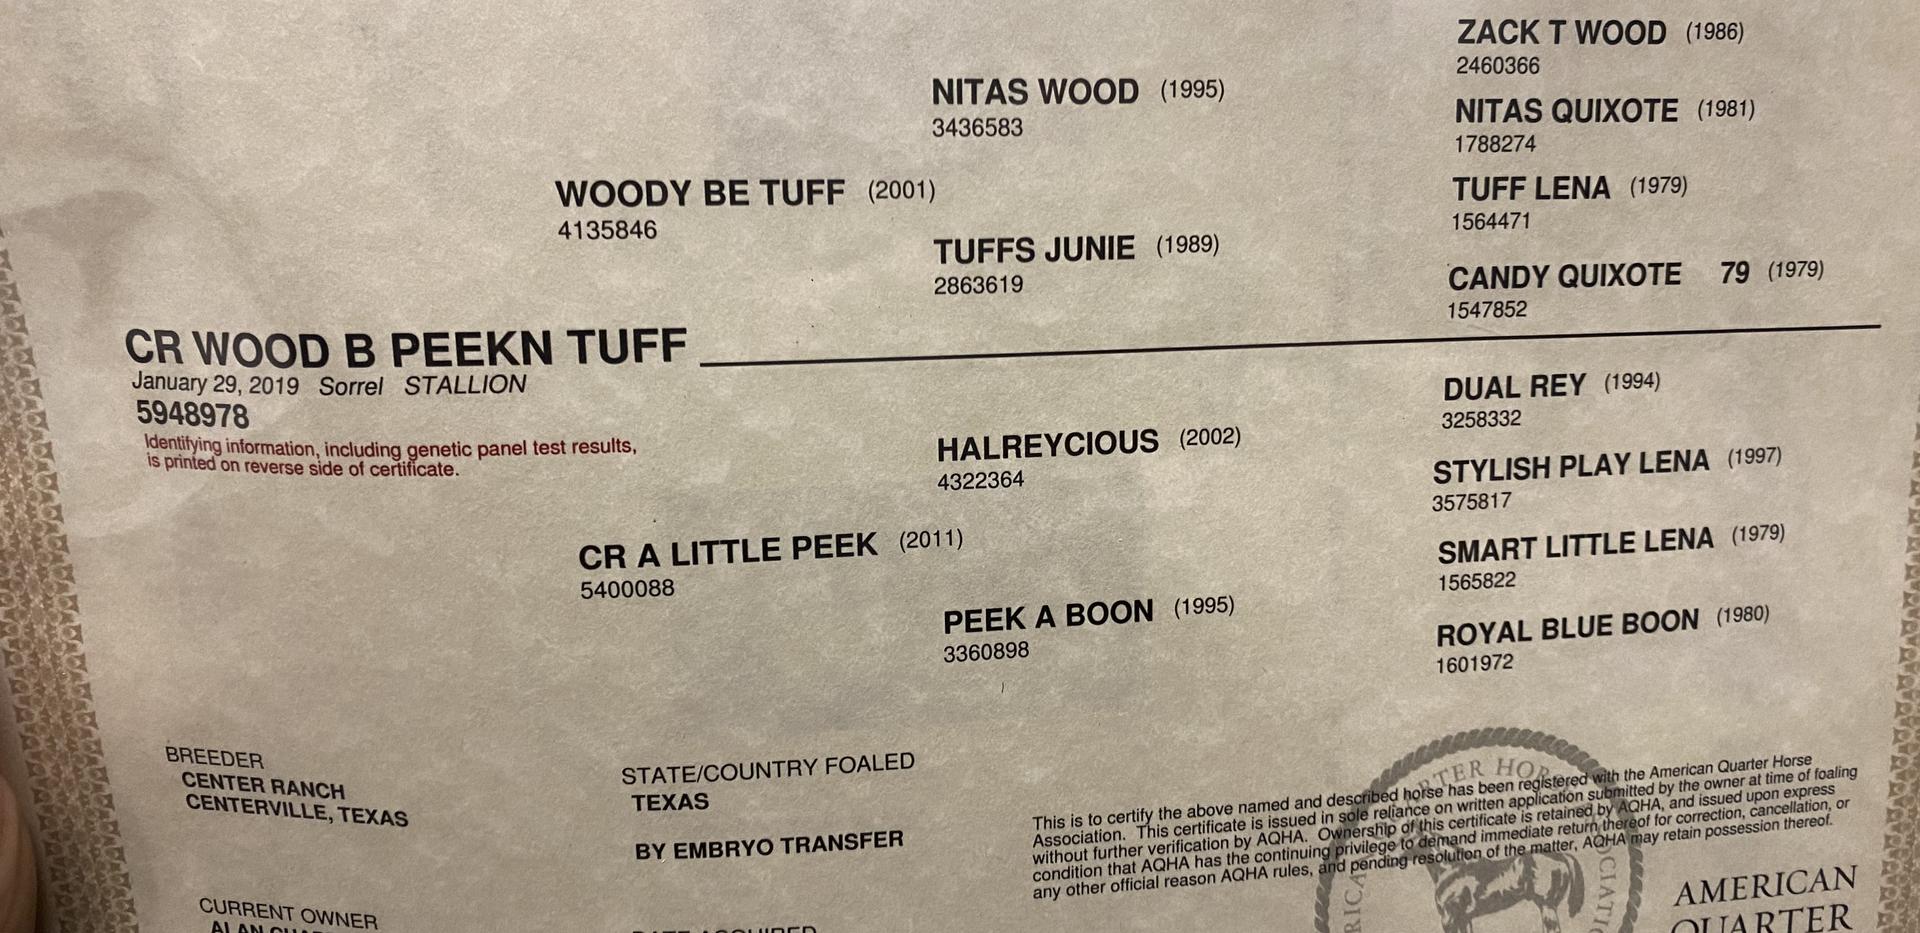 CR Wood B Peekn Tuff - papers.HEIC